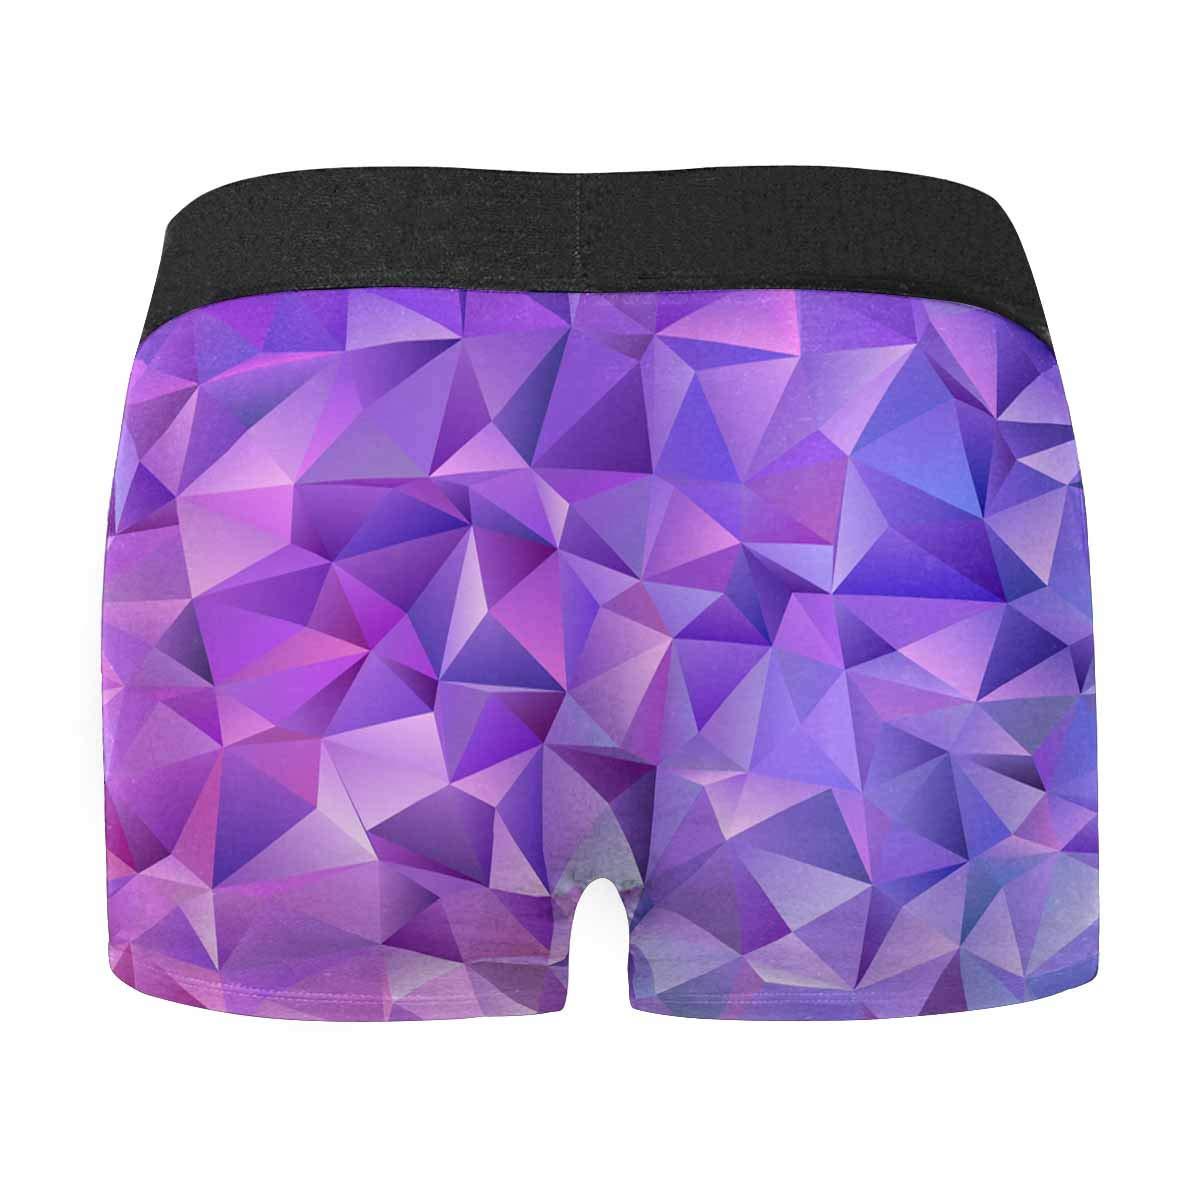 INTERESTPRINT Mens Boxer Briefs Purple Geometric Pattern XS-3XL